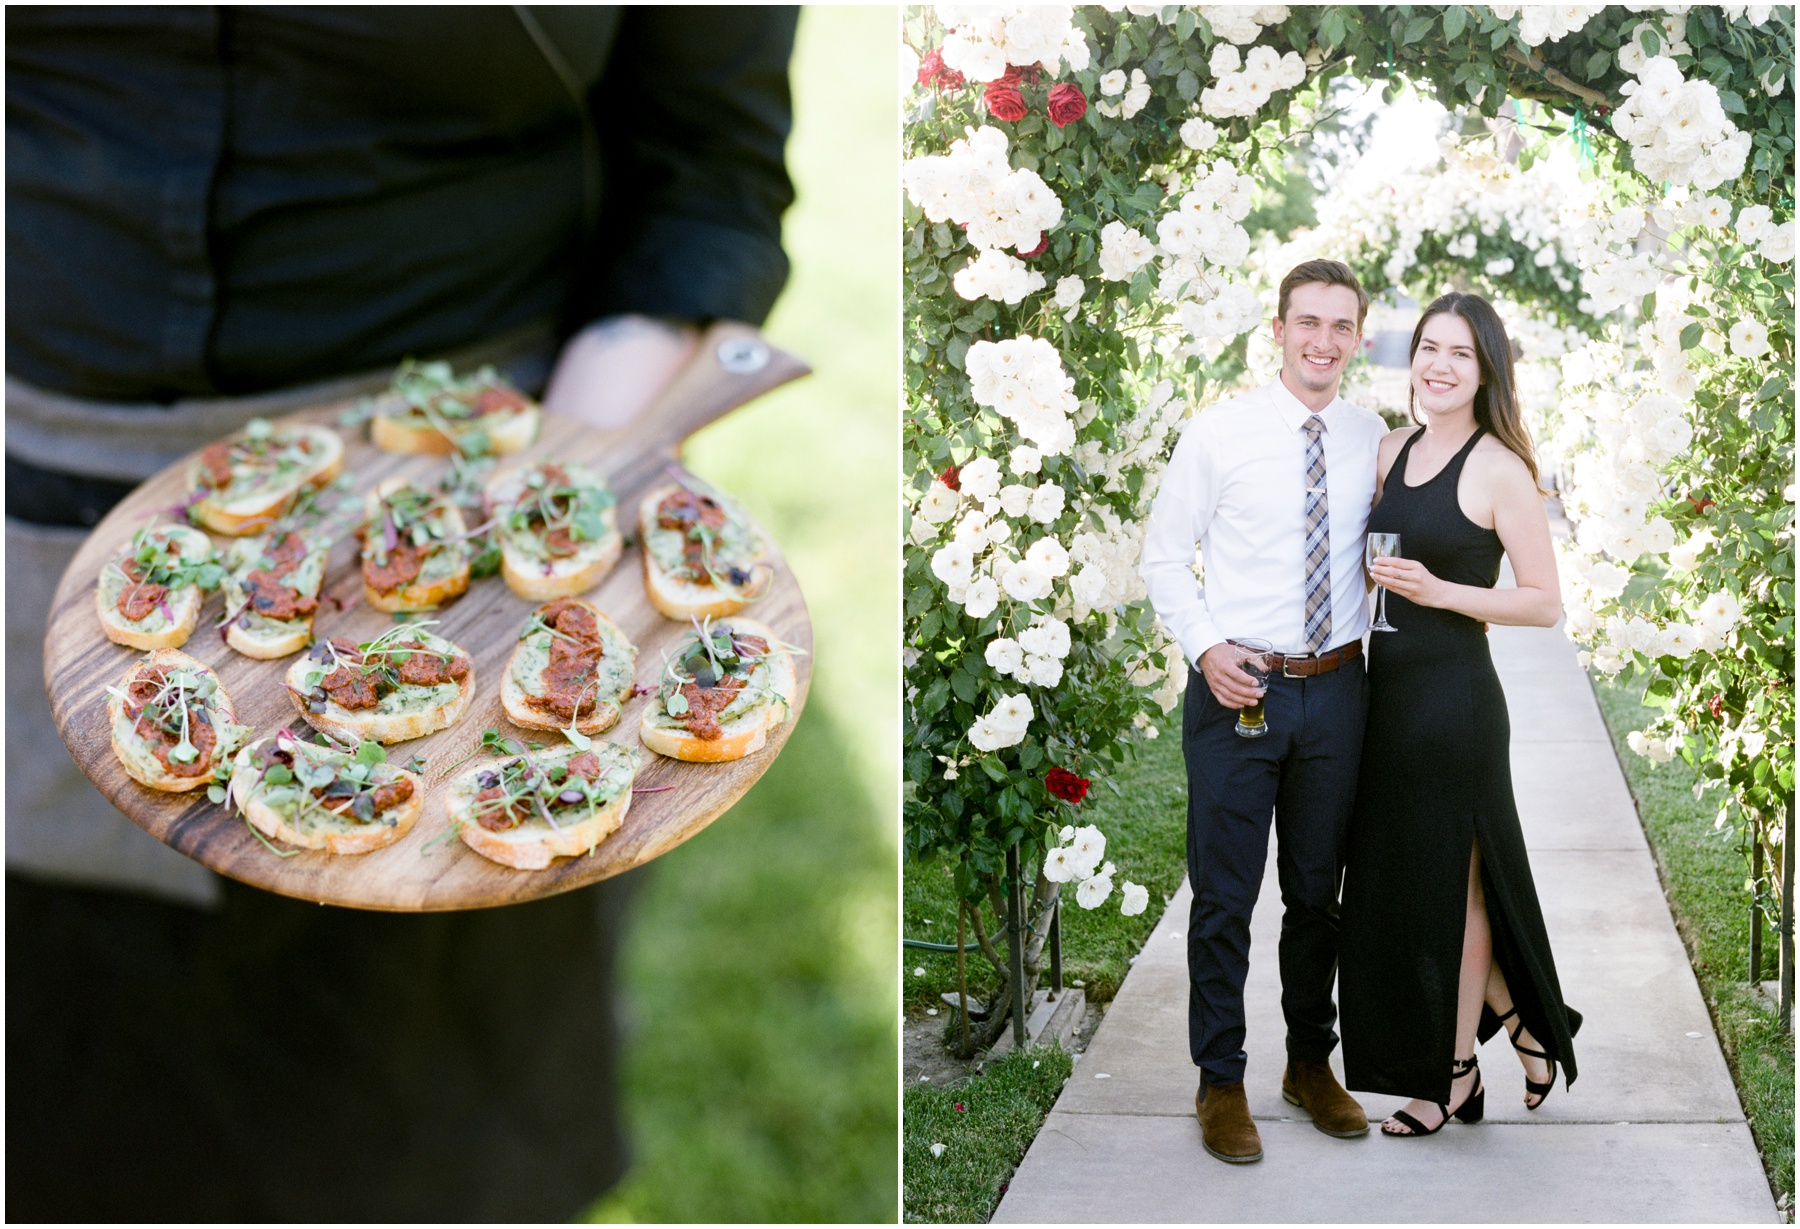 Scribner-bend-vineyards-wedding-sacramento-california-Kristine-Herman-Photography-3.jpg